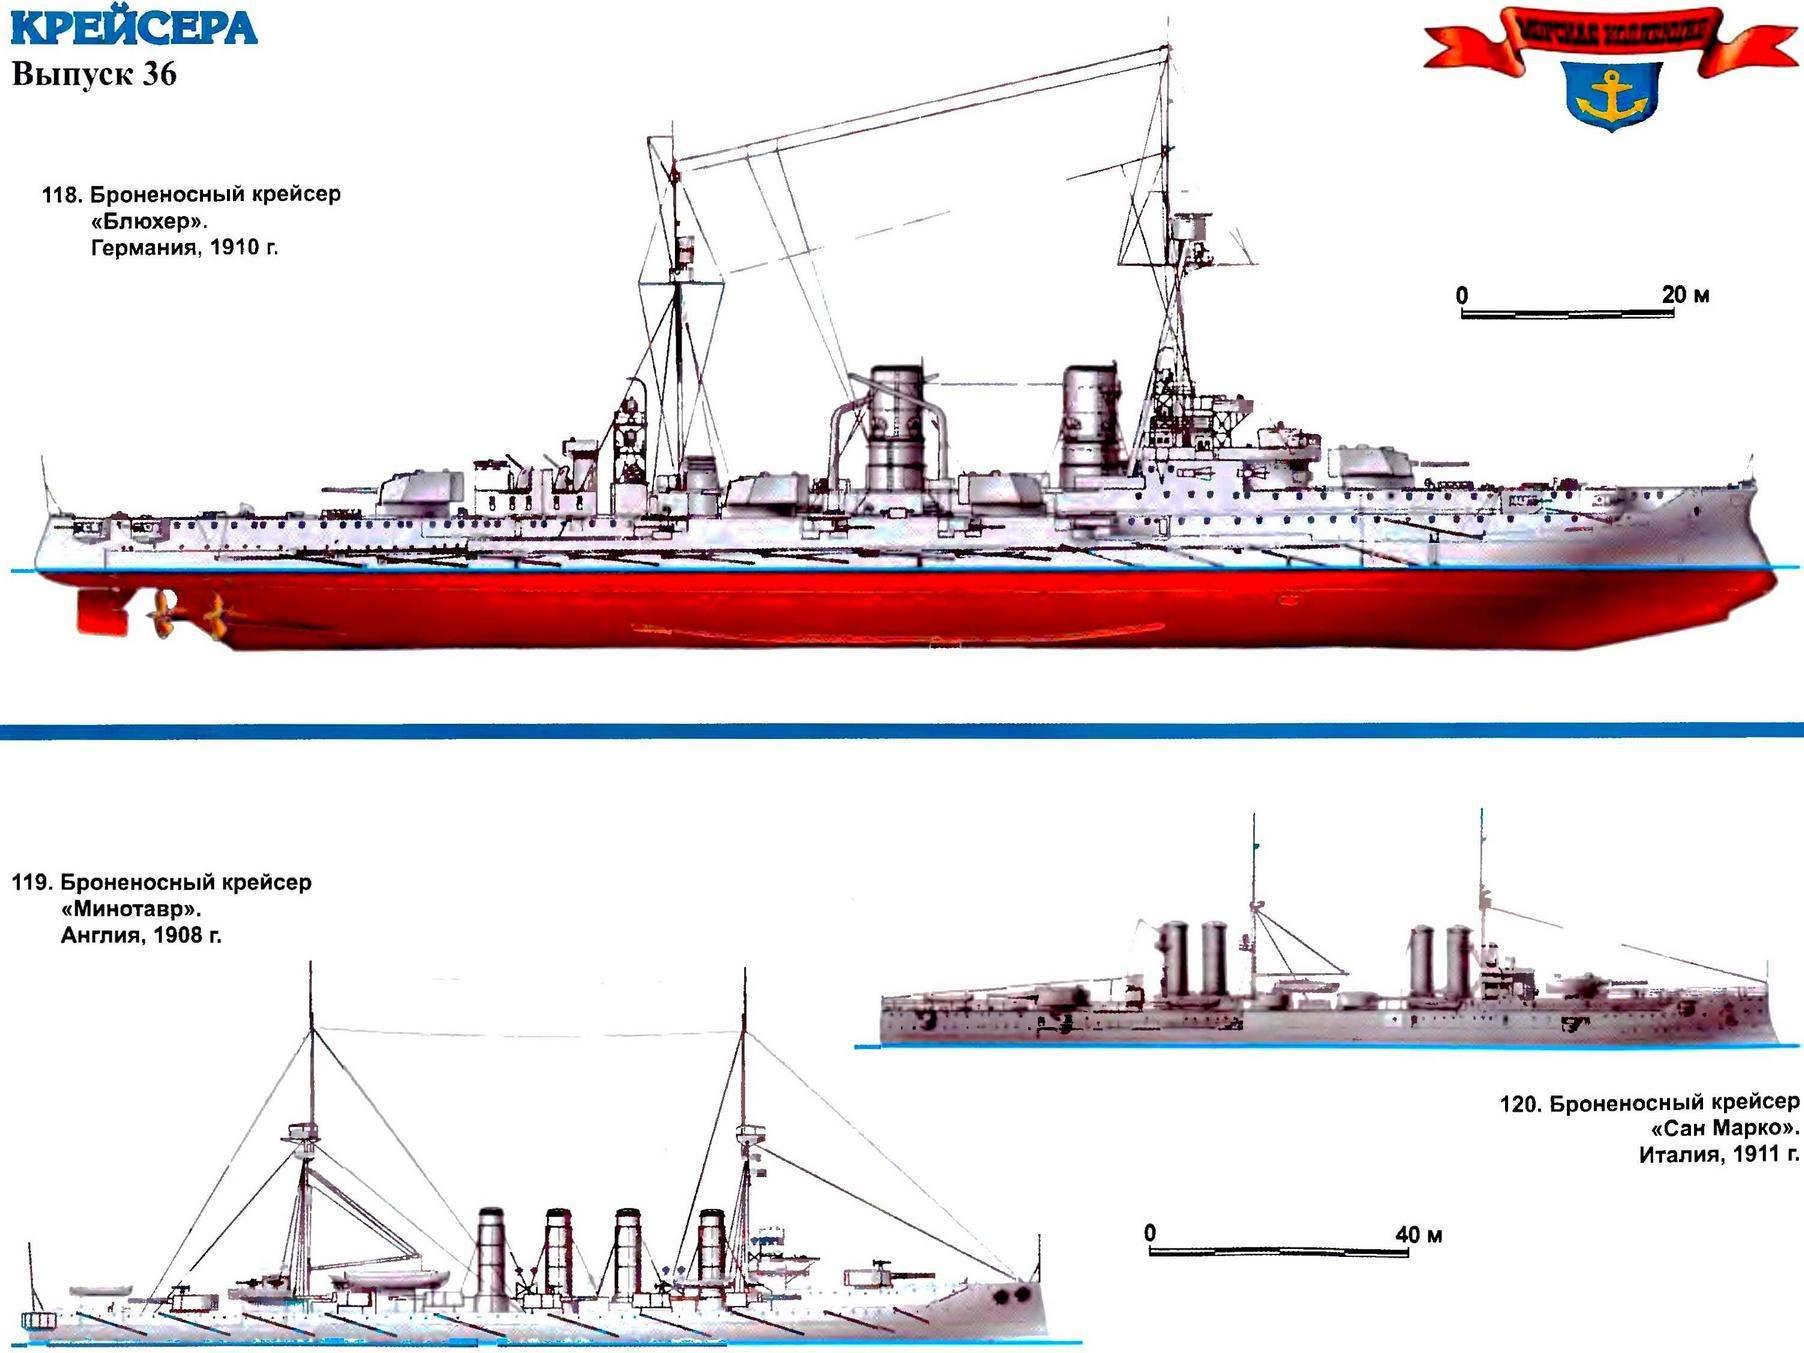 118. Броненосный крейсер «Блюхер» (Германия, 1910 г.)